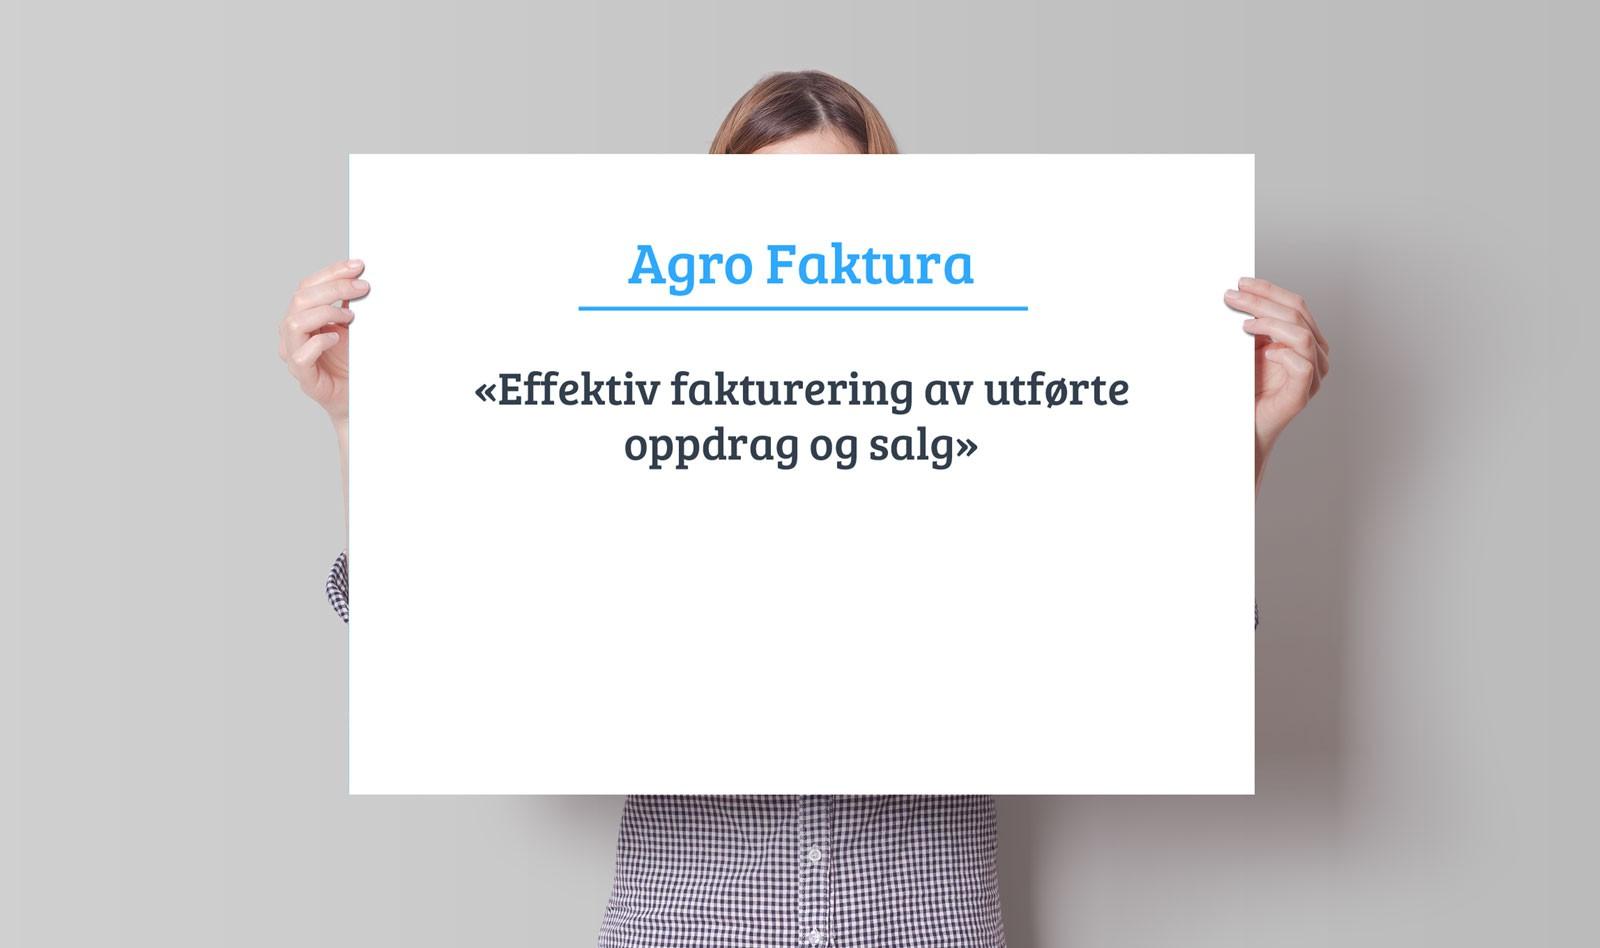 714ac5c81 Agro Faktura - Agro Økonomi